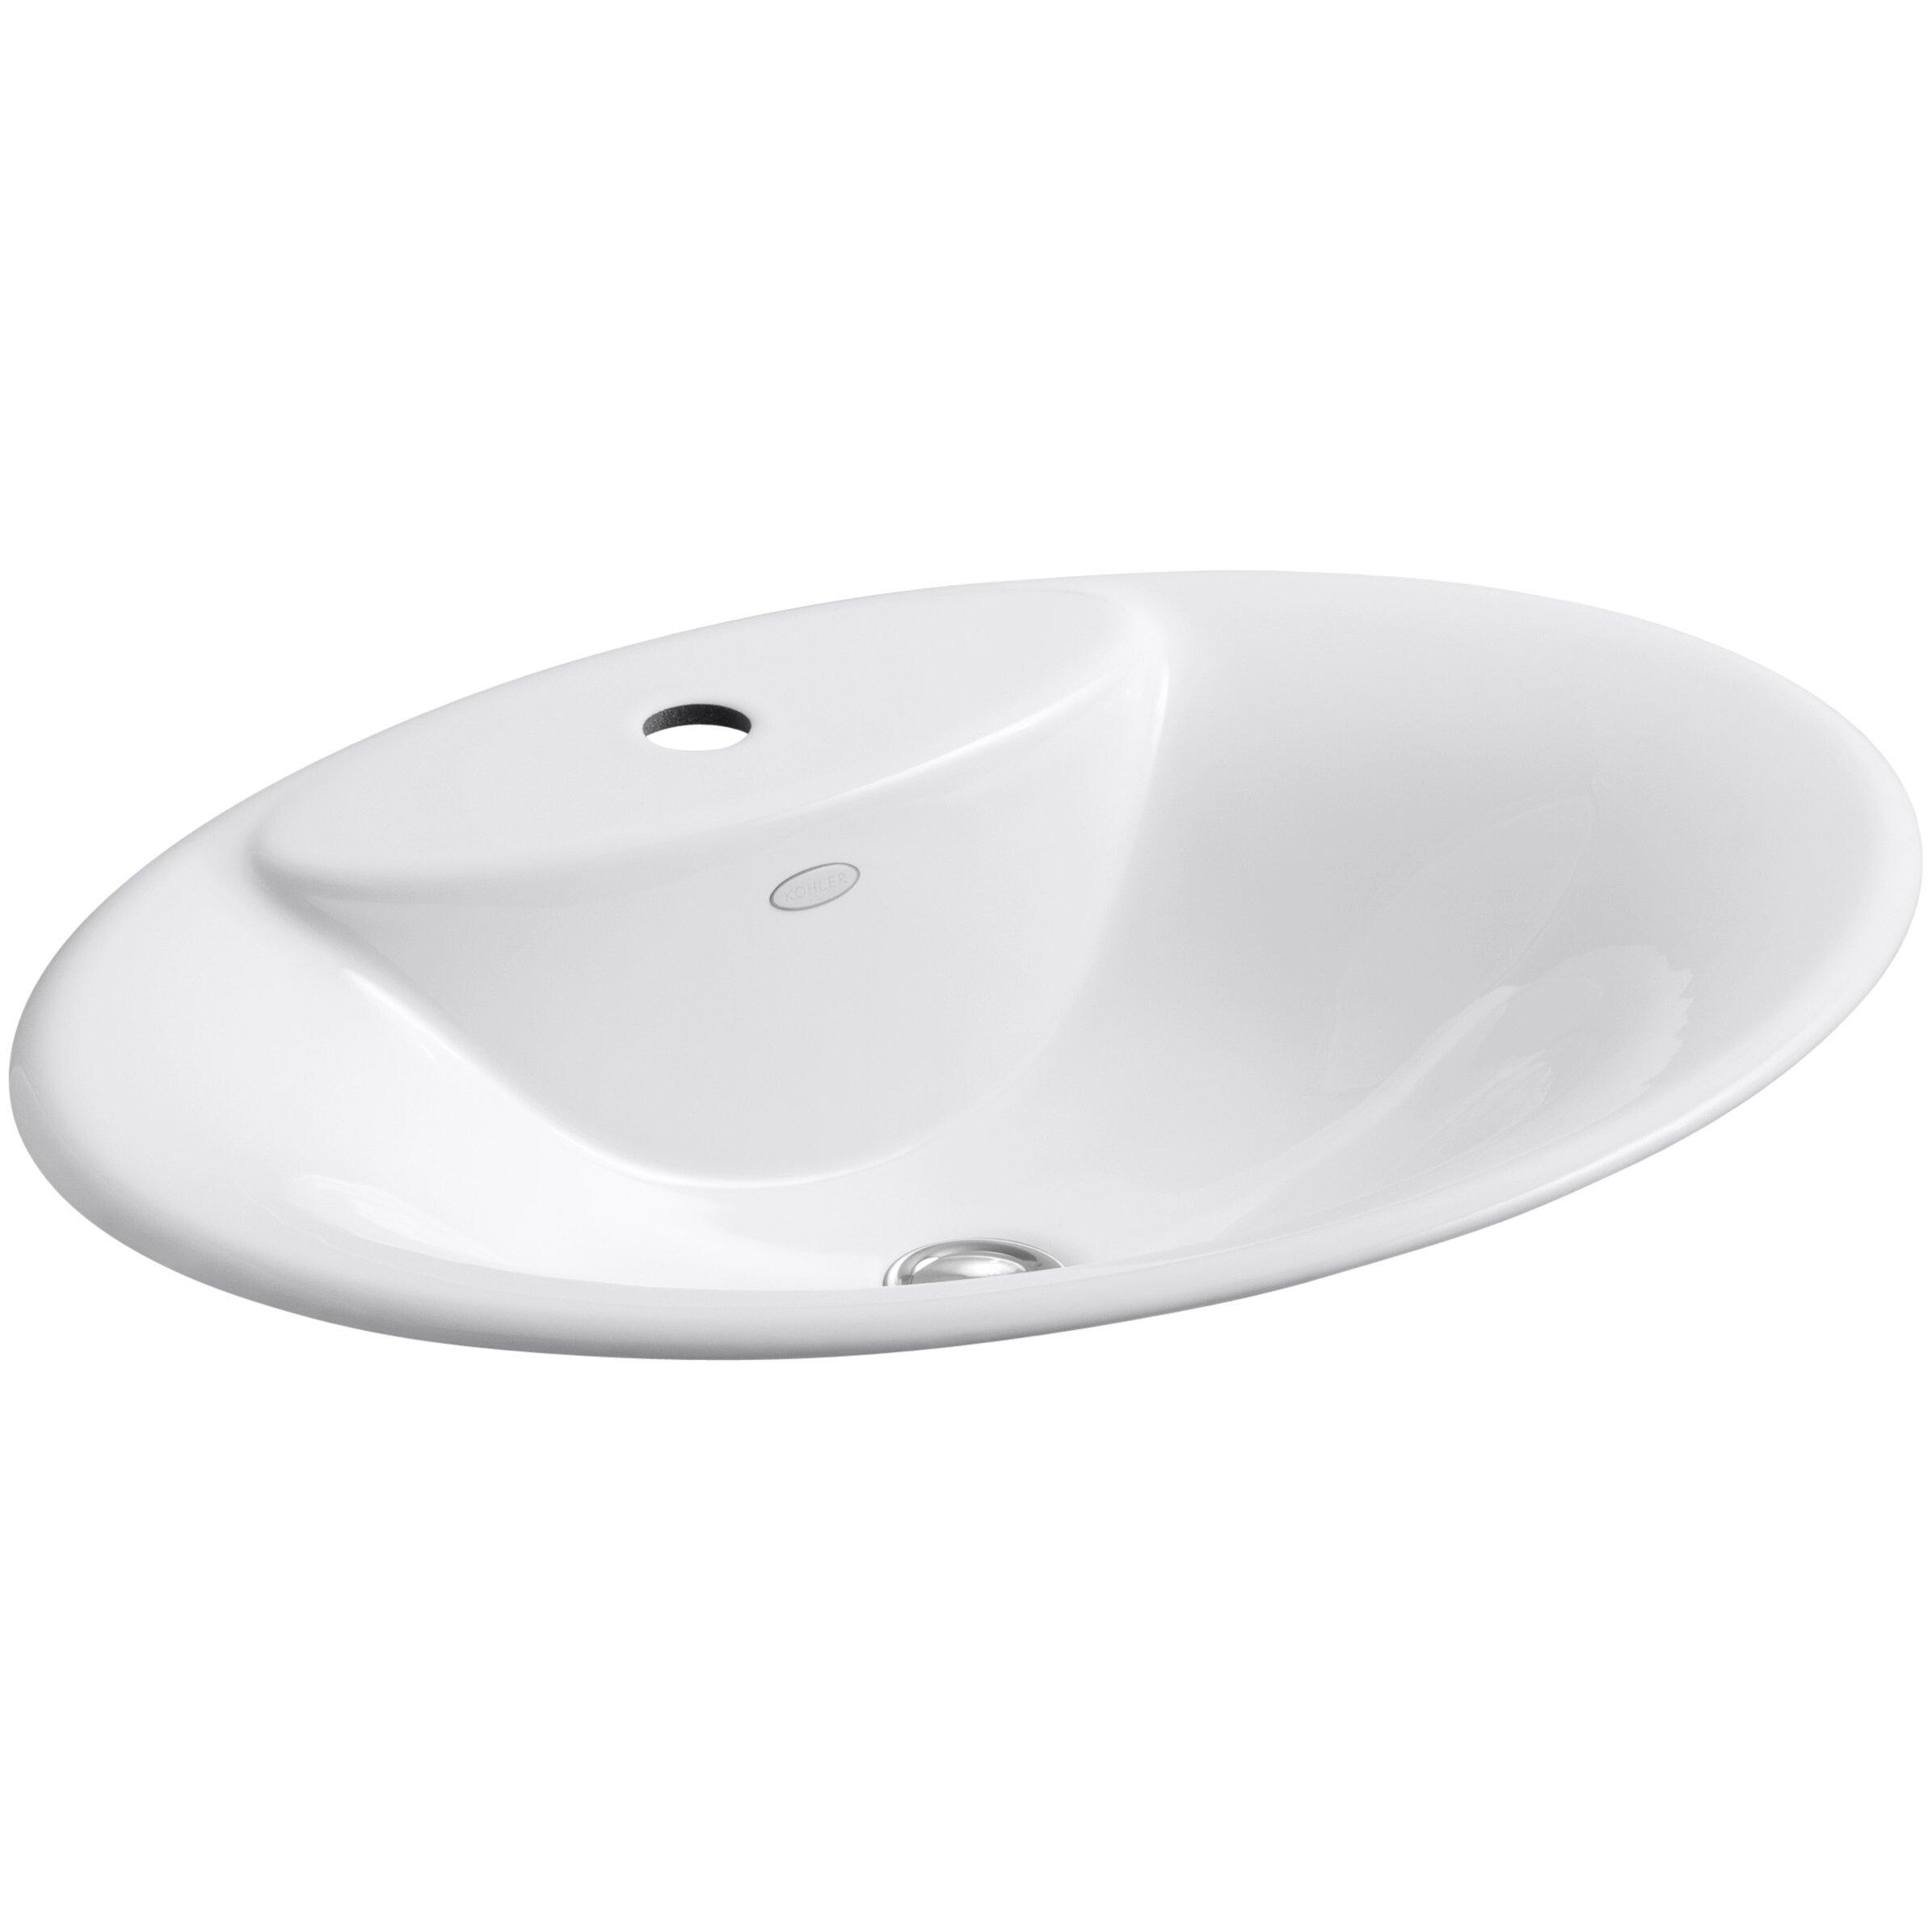 Kohler maratea drop in bathroom sink with single faucet hole reviews wayfair for Kohler bathroom single hole faucets